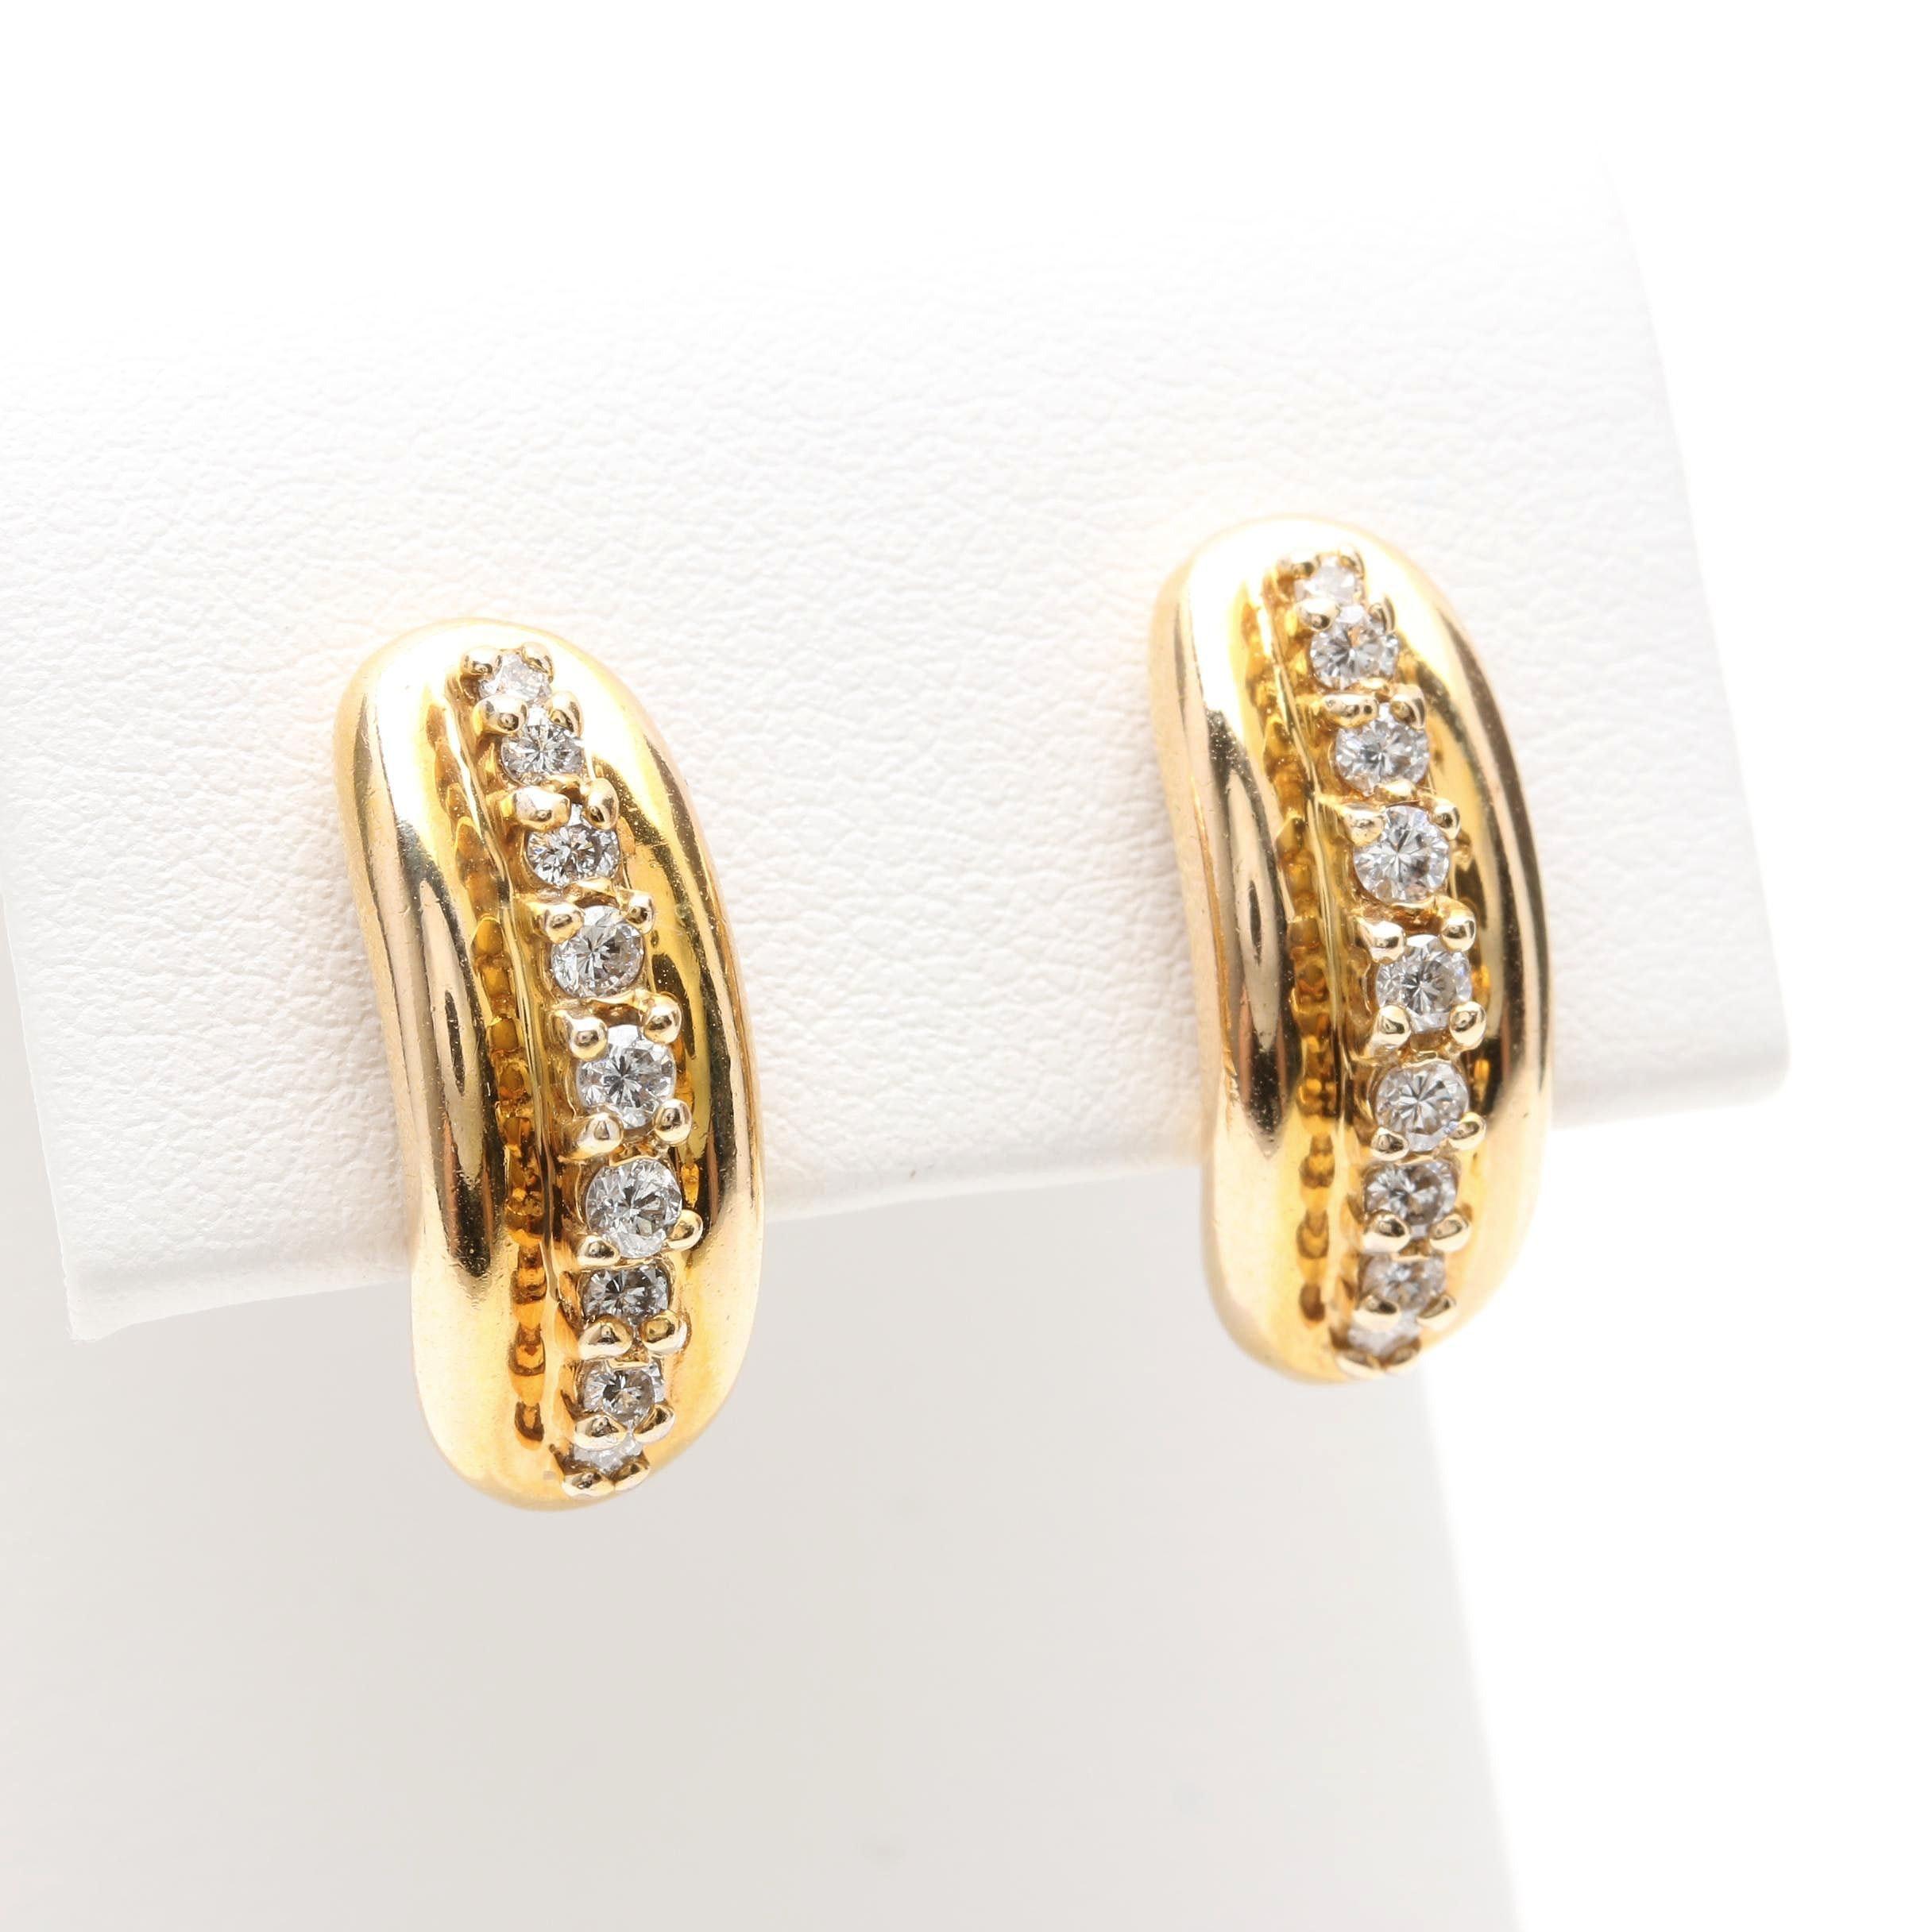 14K Yellow Gold Diamond Earrings